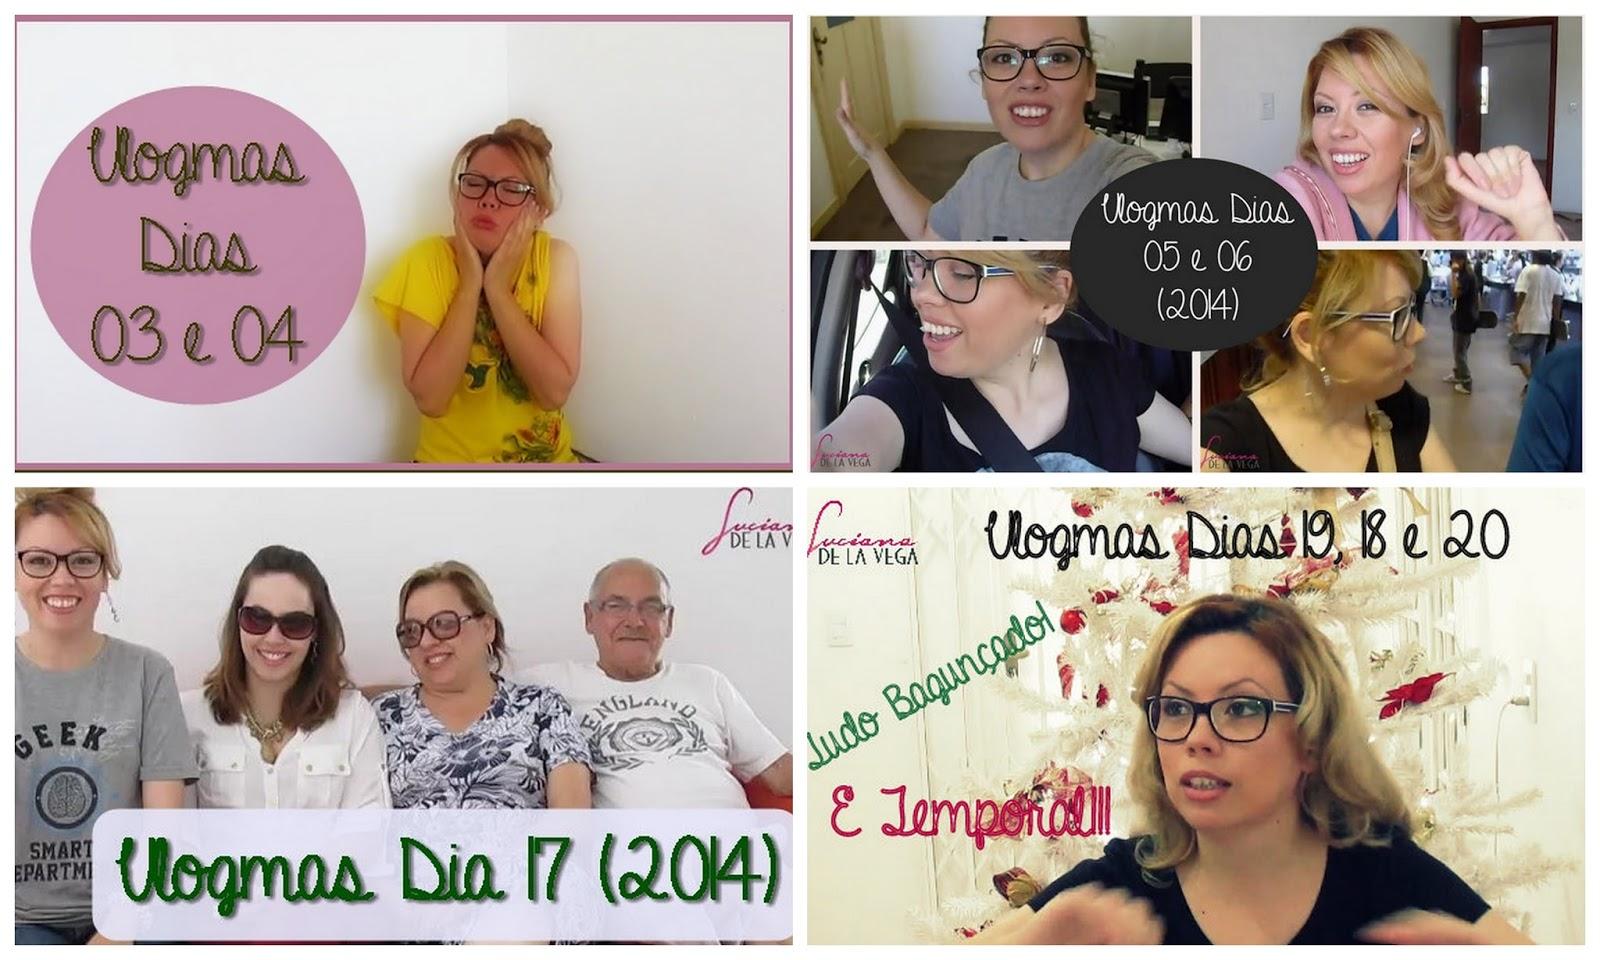 imagens dos vídeos, vlogmas, dezembro todo dia, vlog, Luciana De La Vega